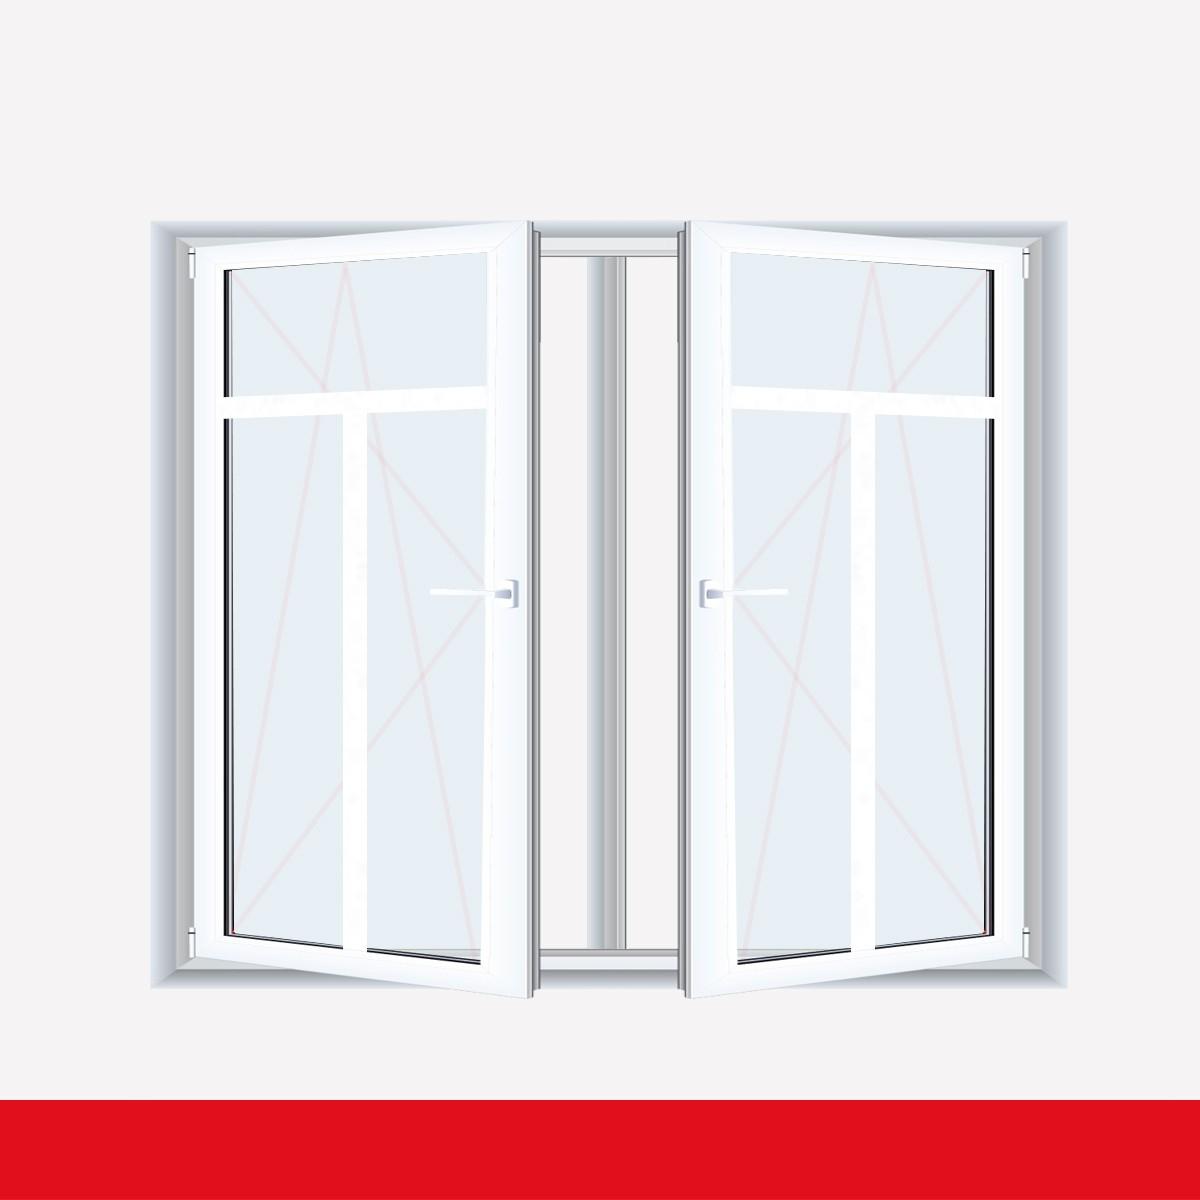 Sprossenfenster Typ 3 Felder Weiss 2 Flg Dk Dk Kunststofffenster